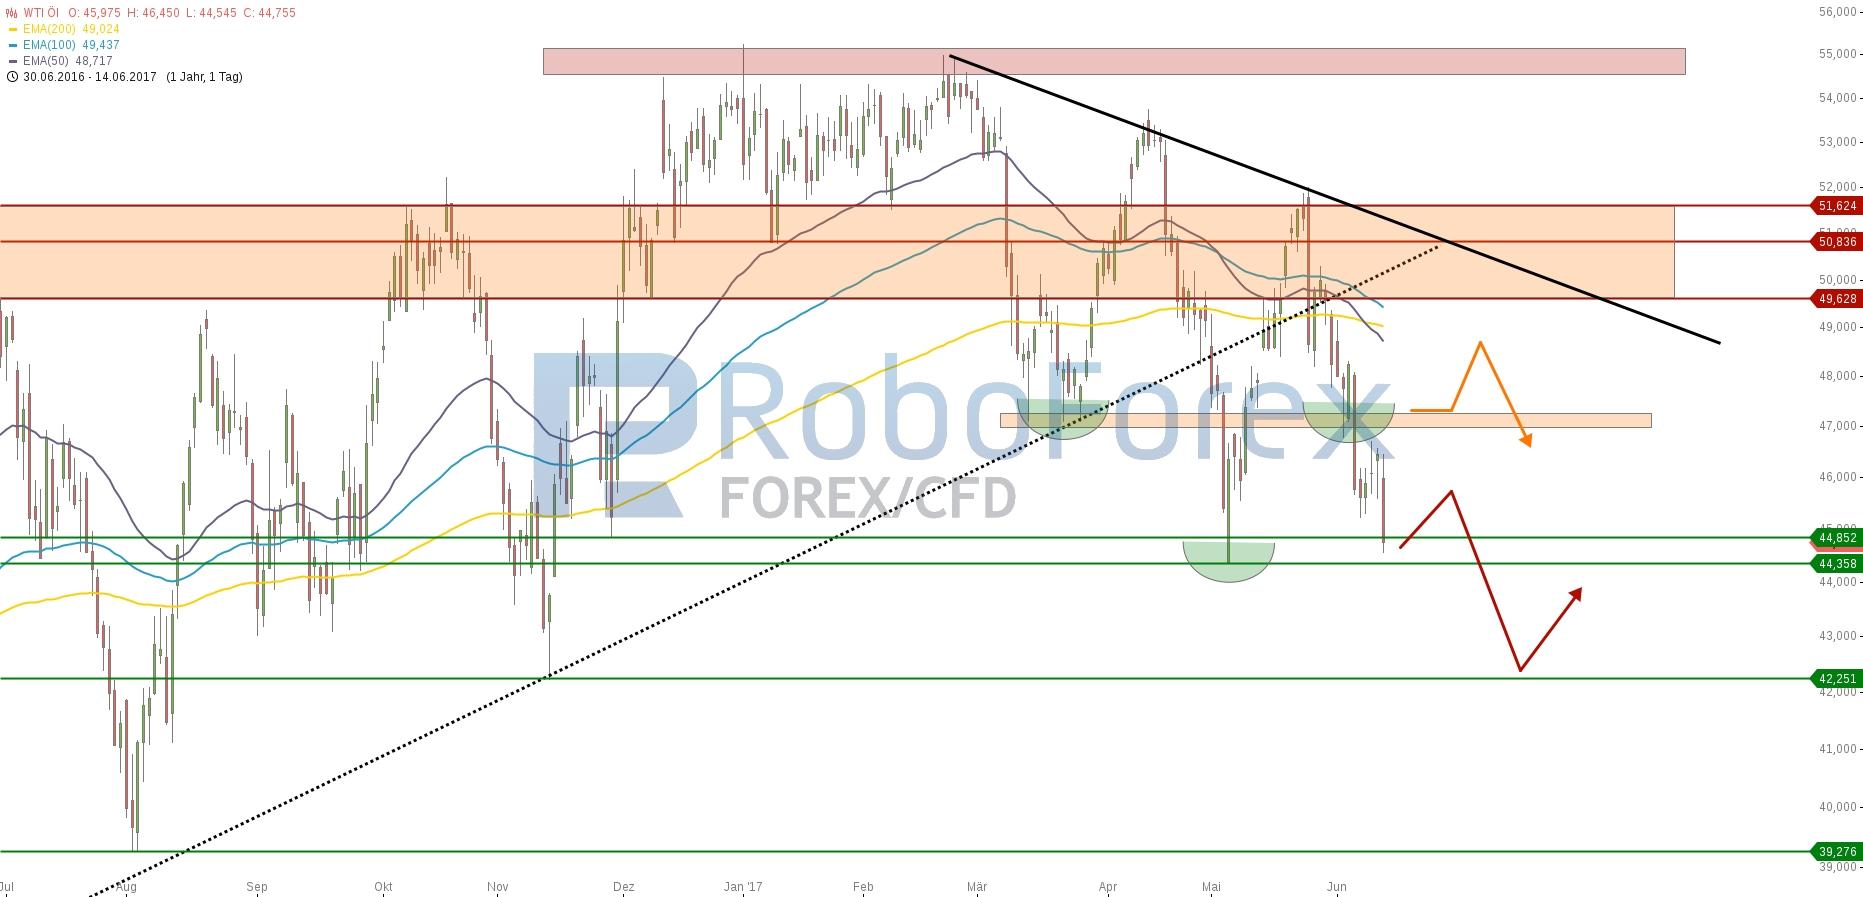 chart-14062017-1936-wtil-roboforex.jpg